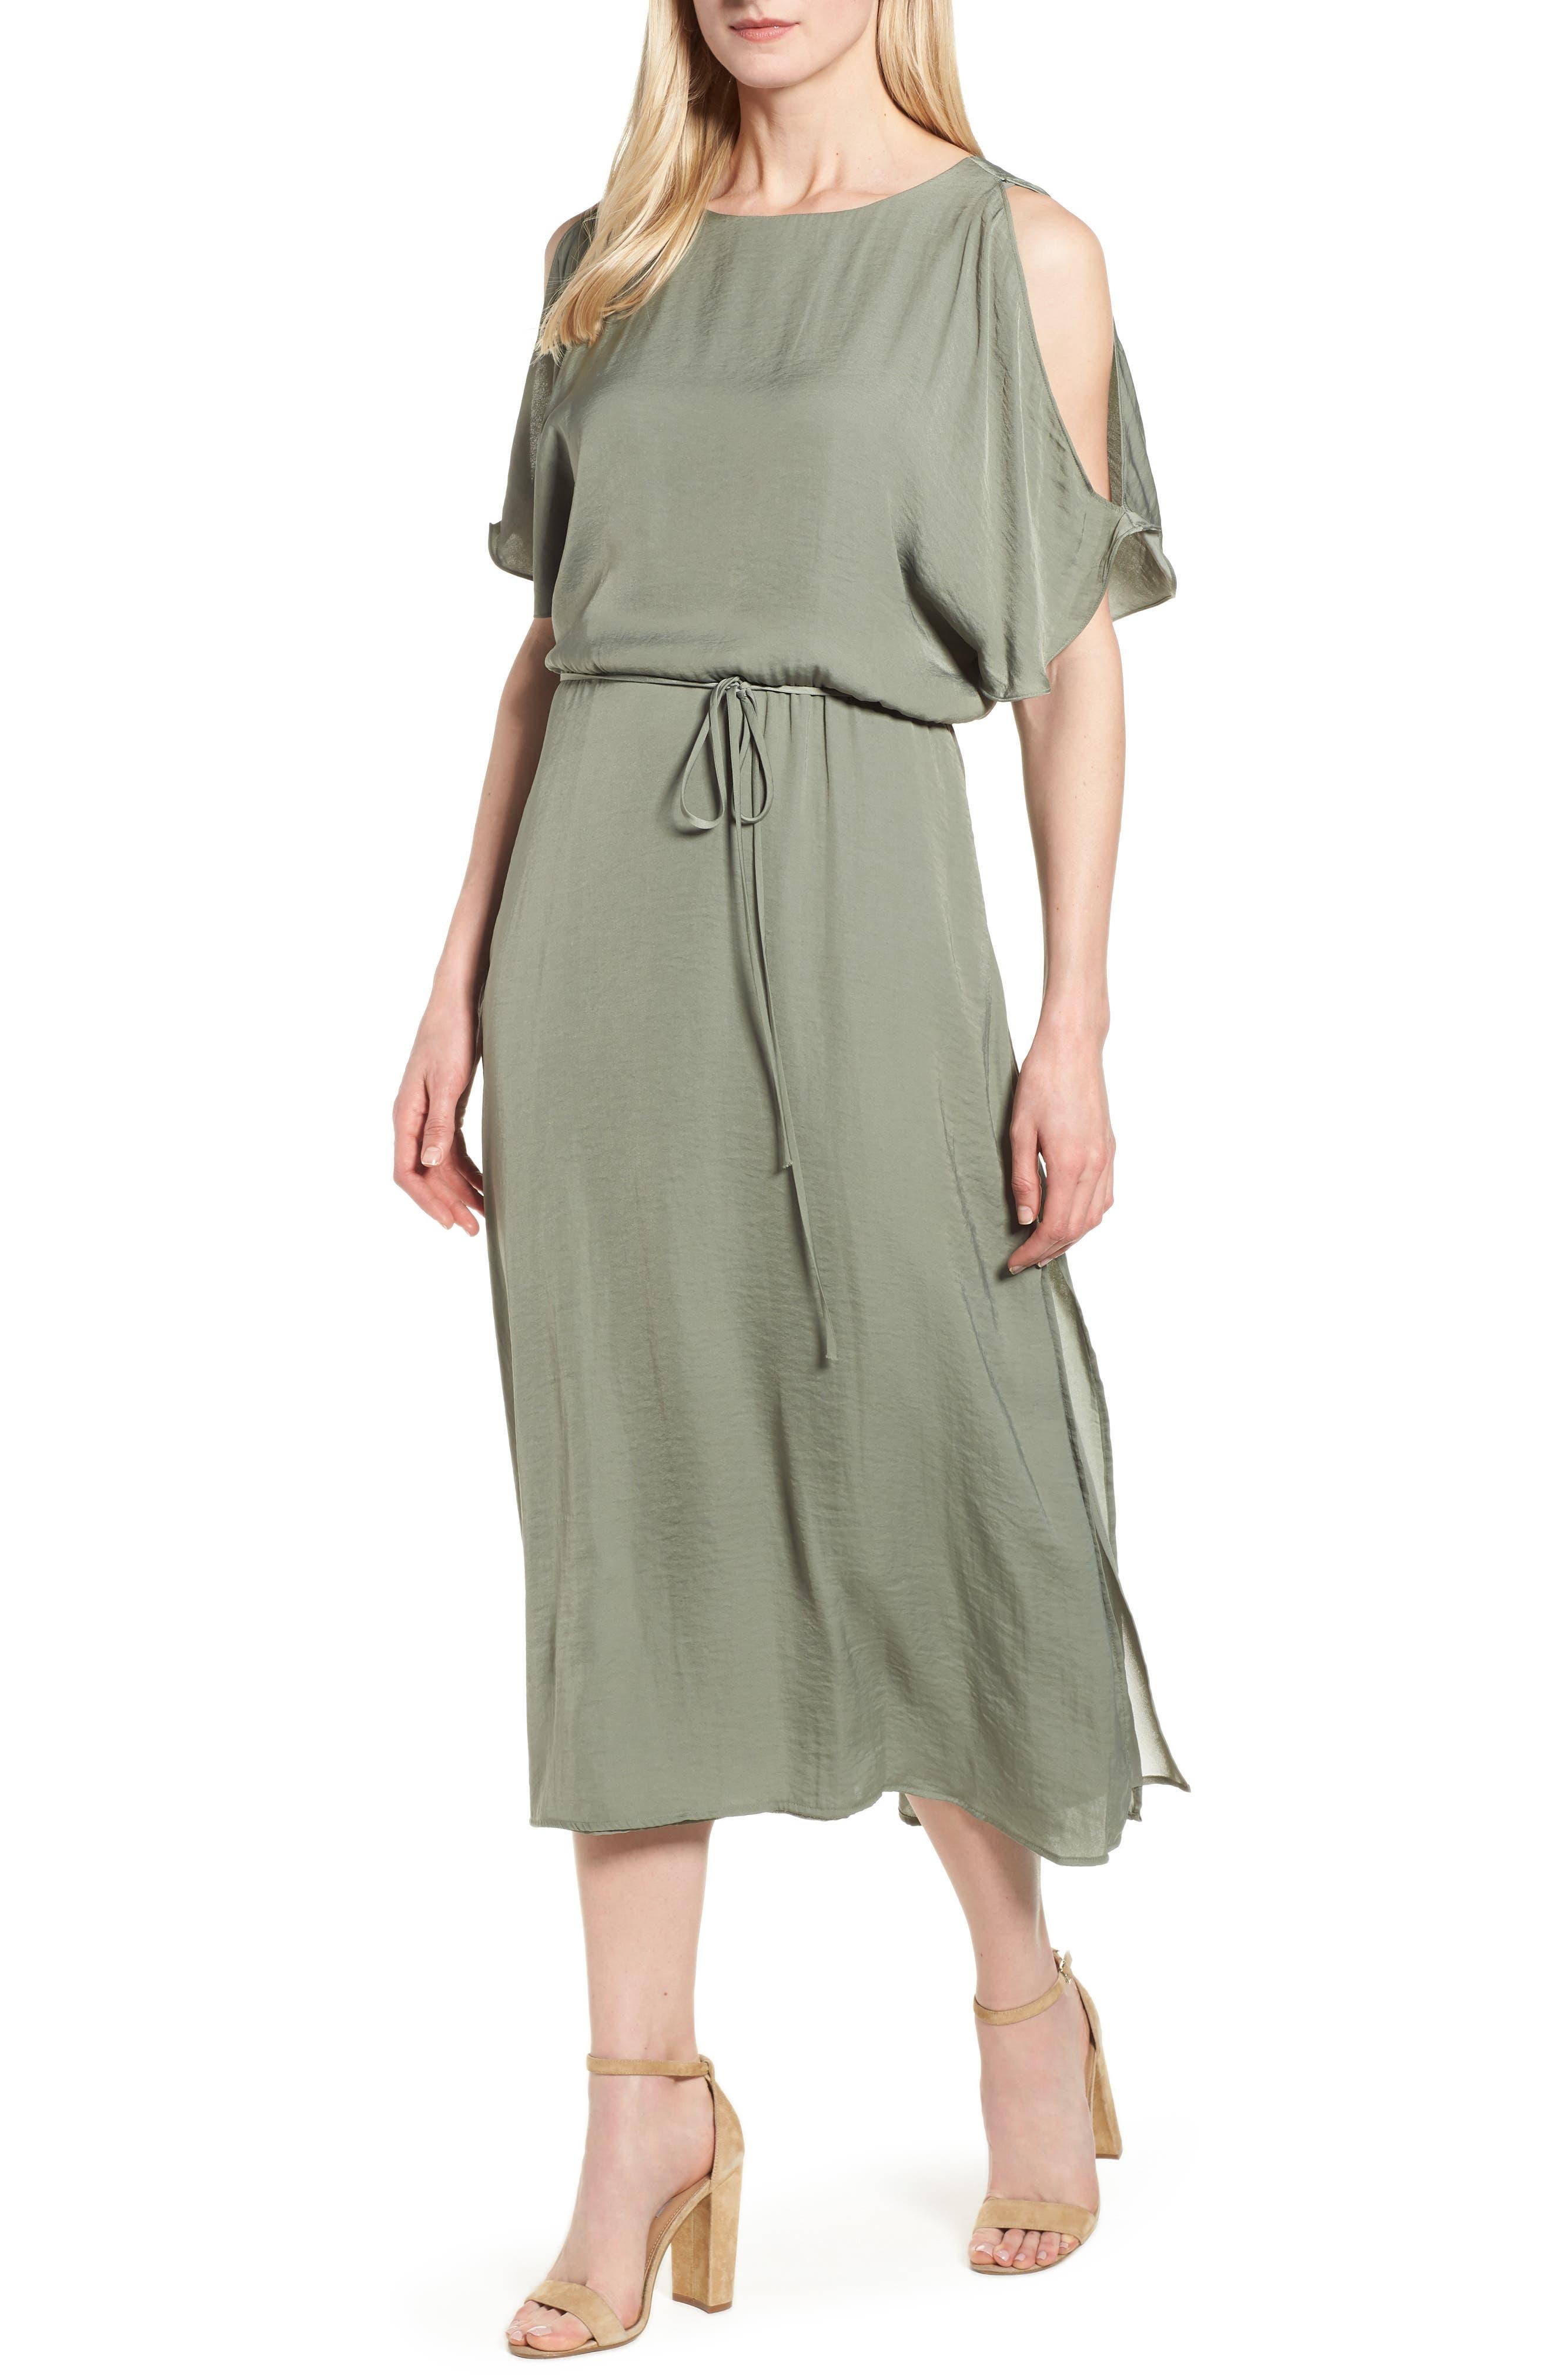 Cold Shoulder Rumpled Satin Dress,                             Main thumbnail 1, color,                             304